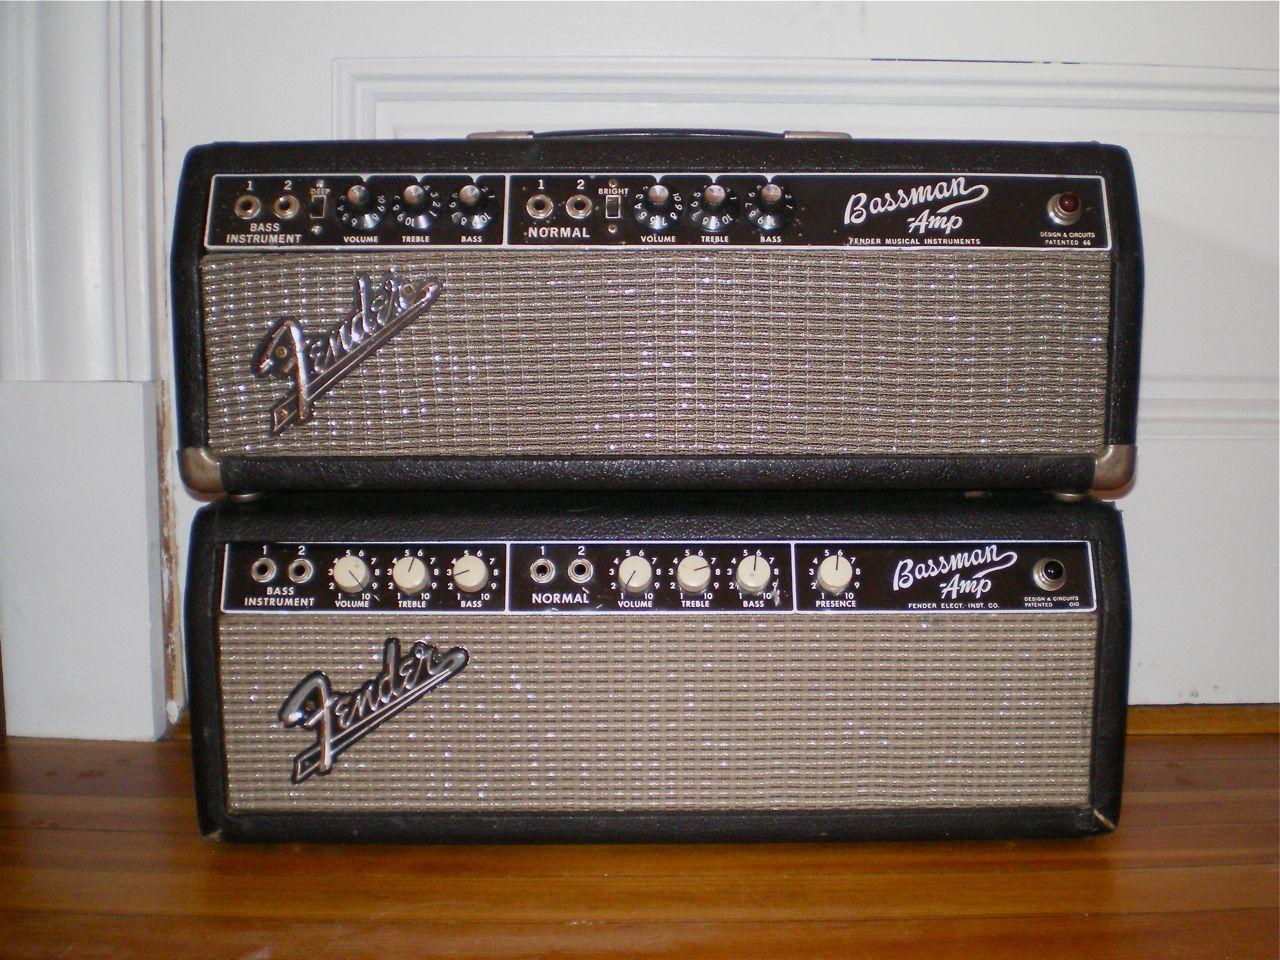 Dating fender bassman amplifier